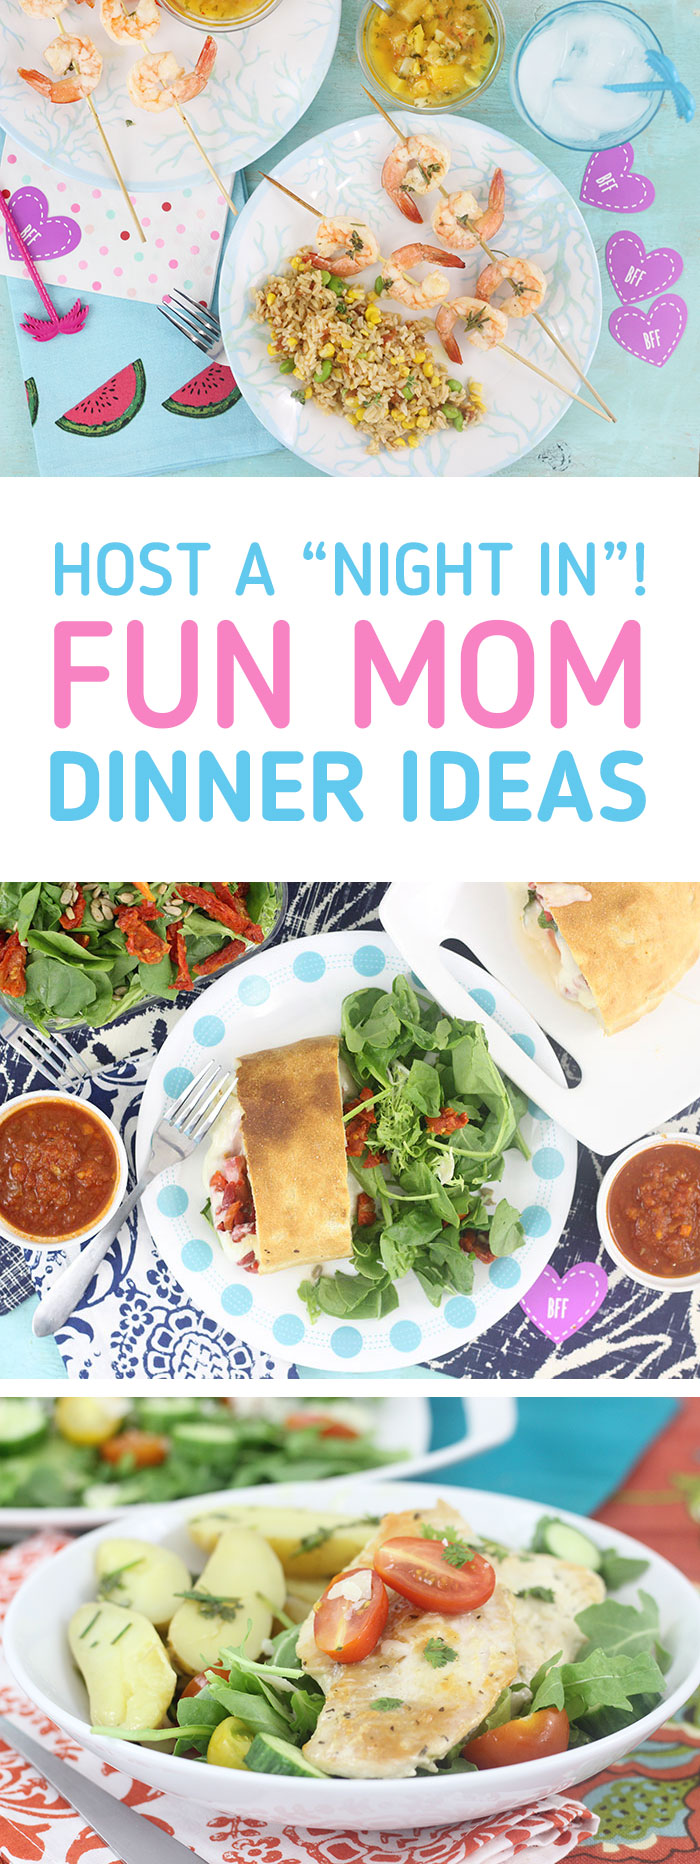 Fun Mom's Night In Dinner Ideas.